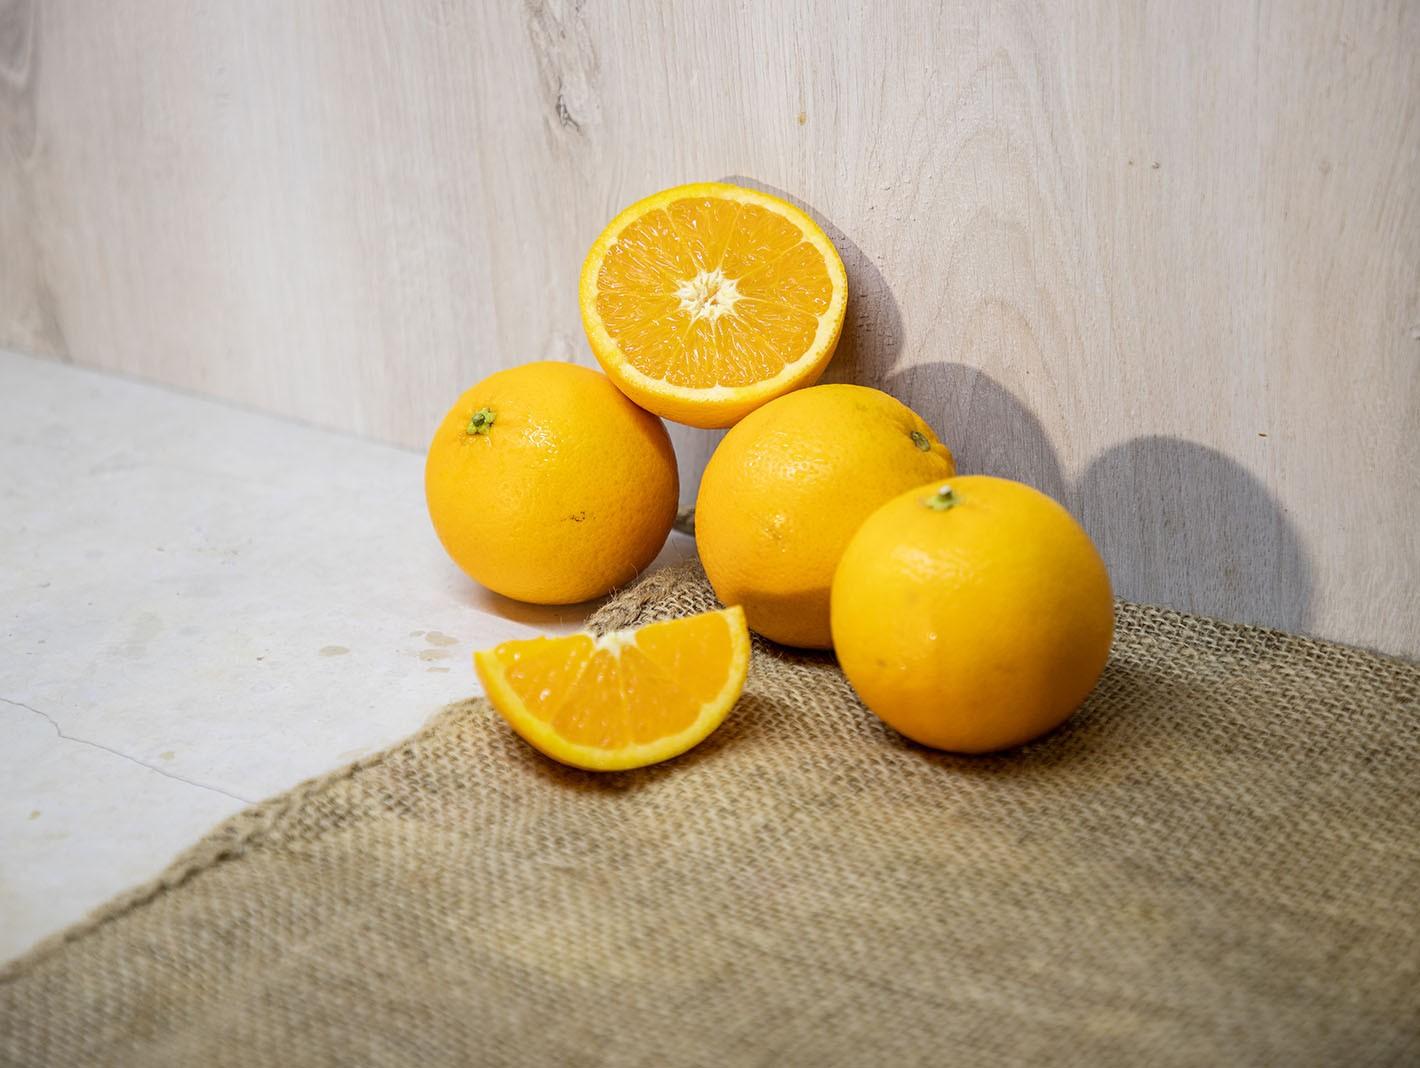 OranFrutta Valencia Oranges